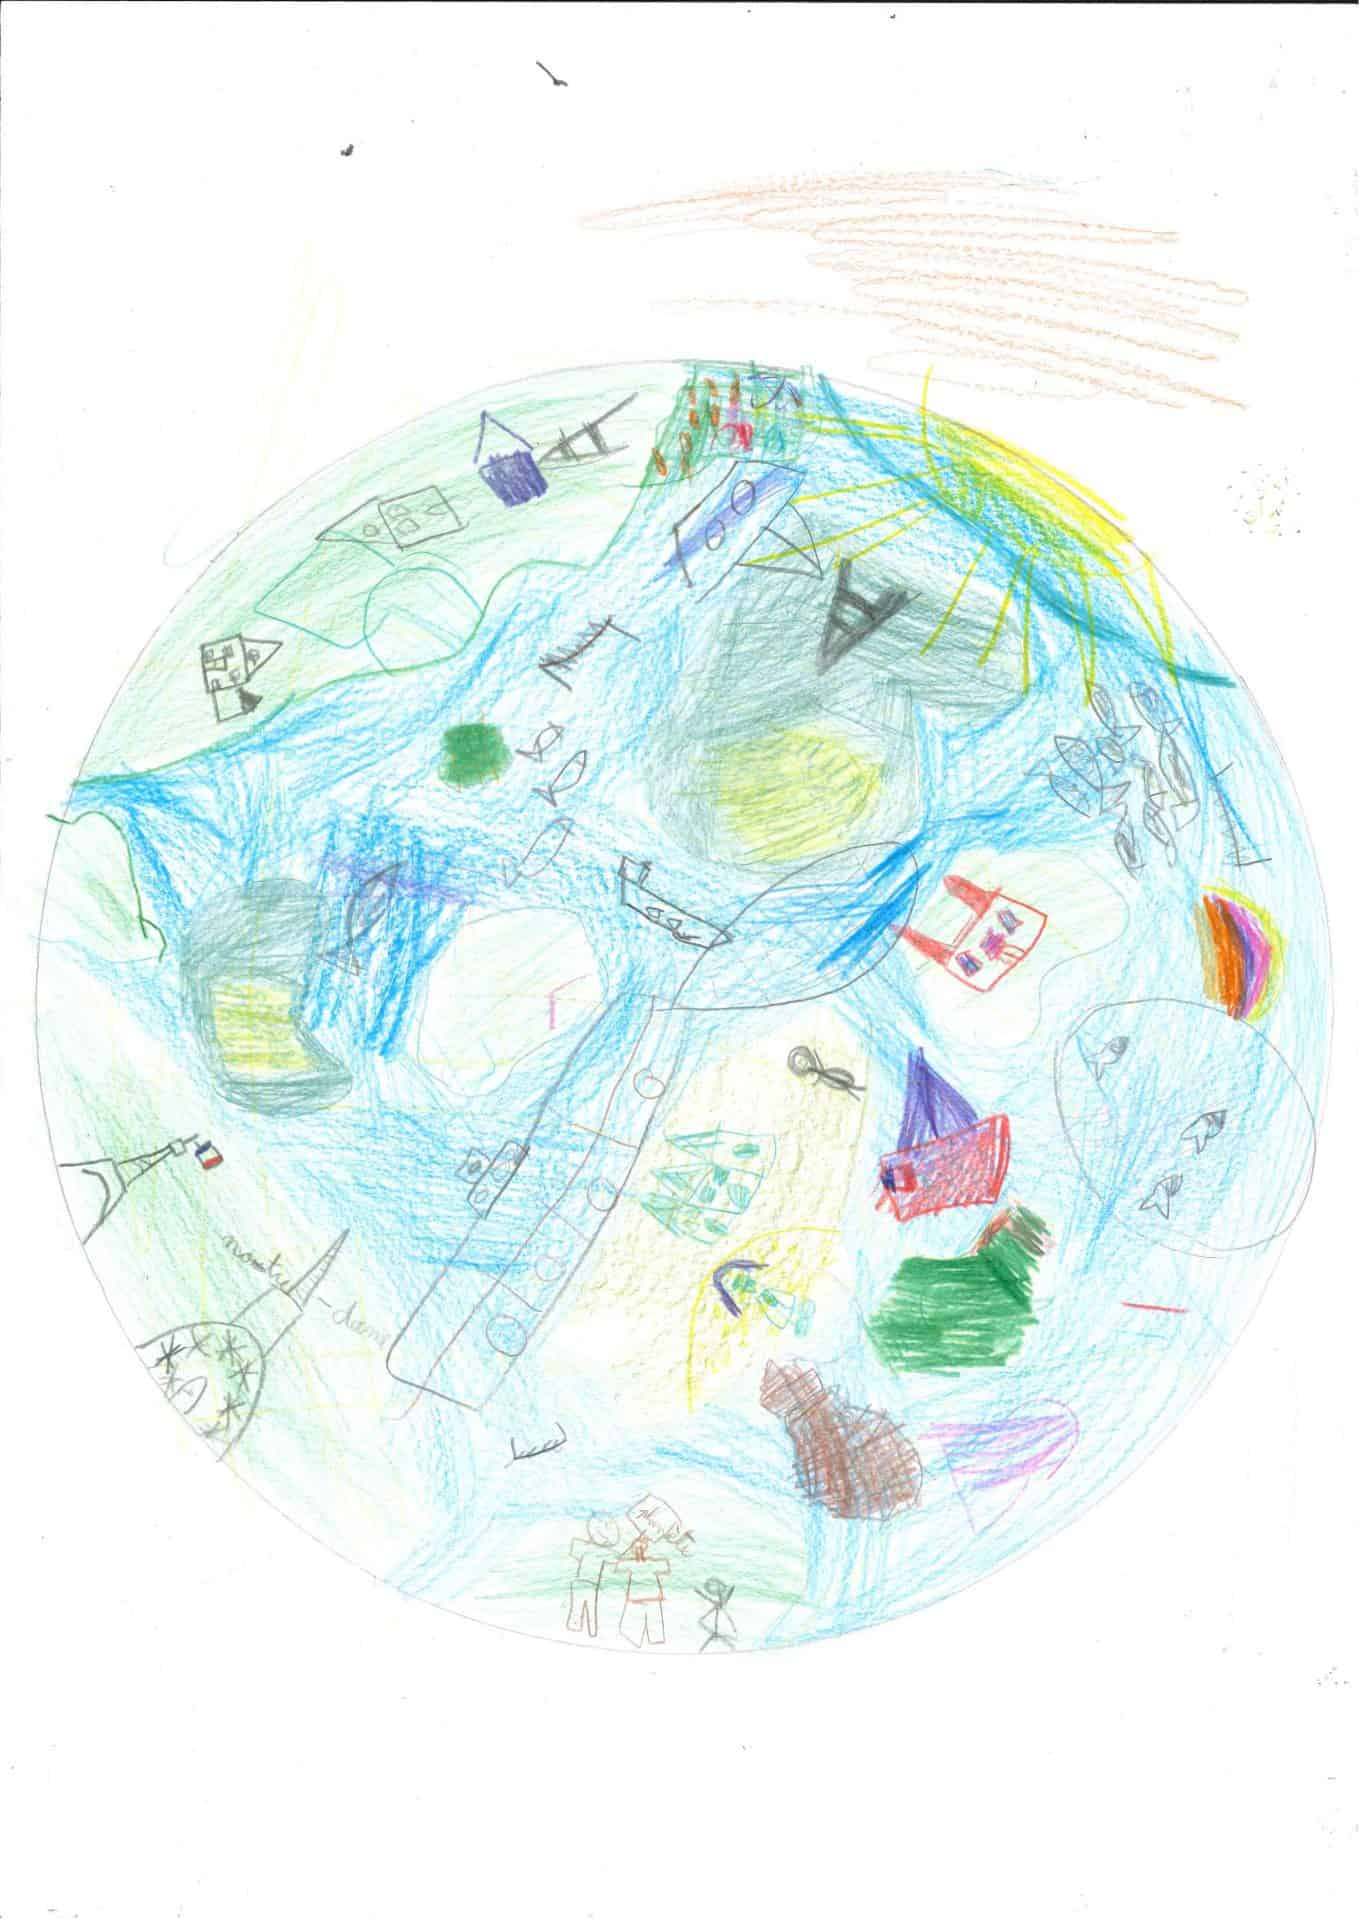 Dessin d'enfant représentant la Terre